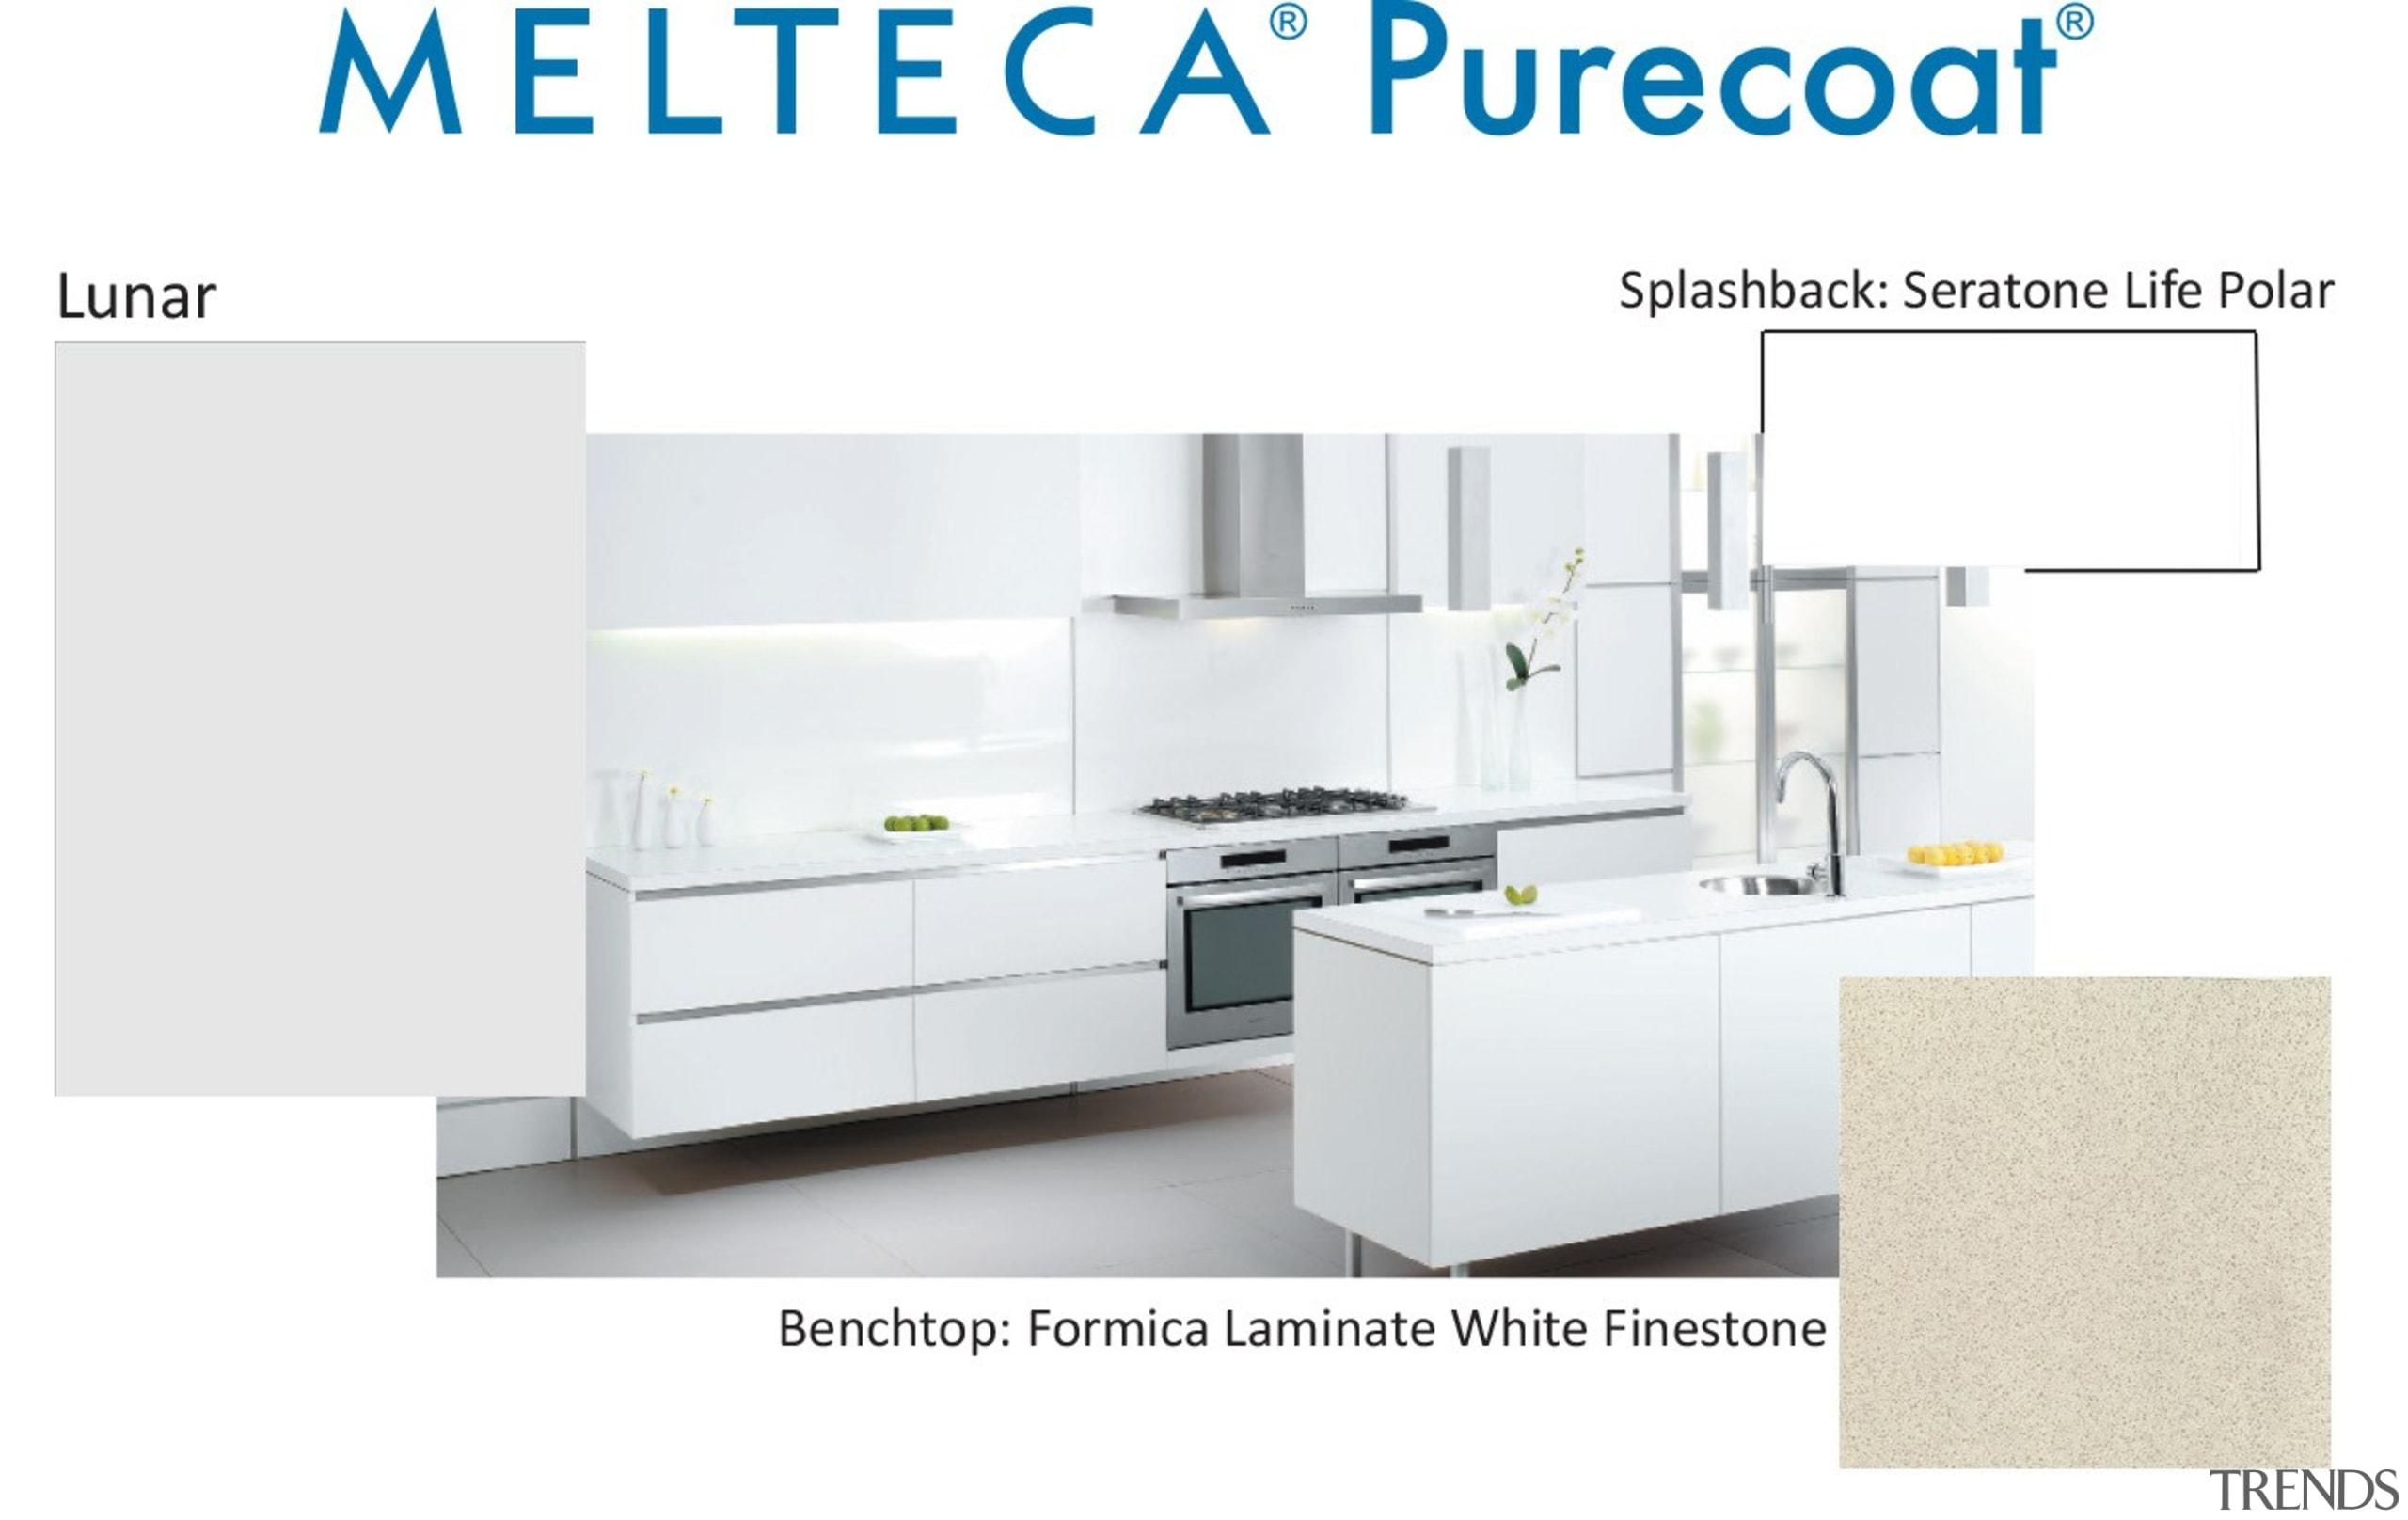 New Zealand made Melteca Purecoat surfaces utilise cutting-edge furniture, kitchen, product, product design, table, white